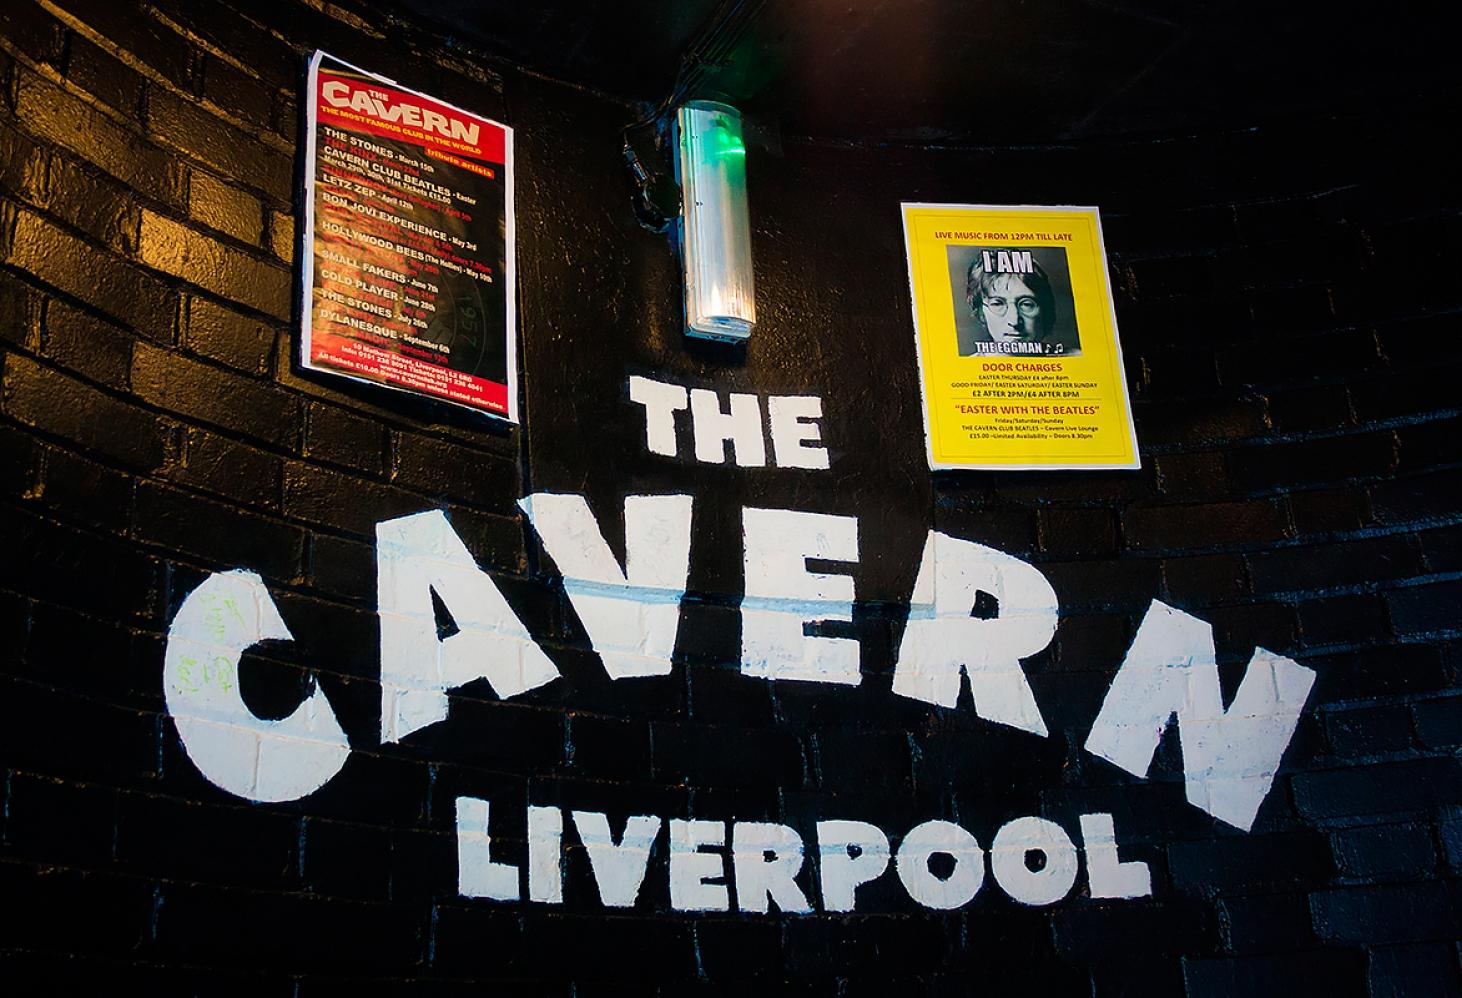 The Cavern Club, Ливерпуль